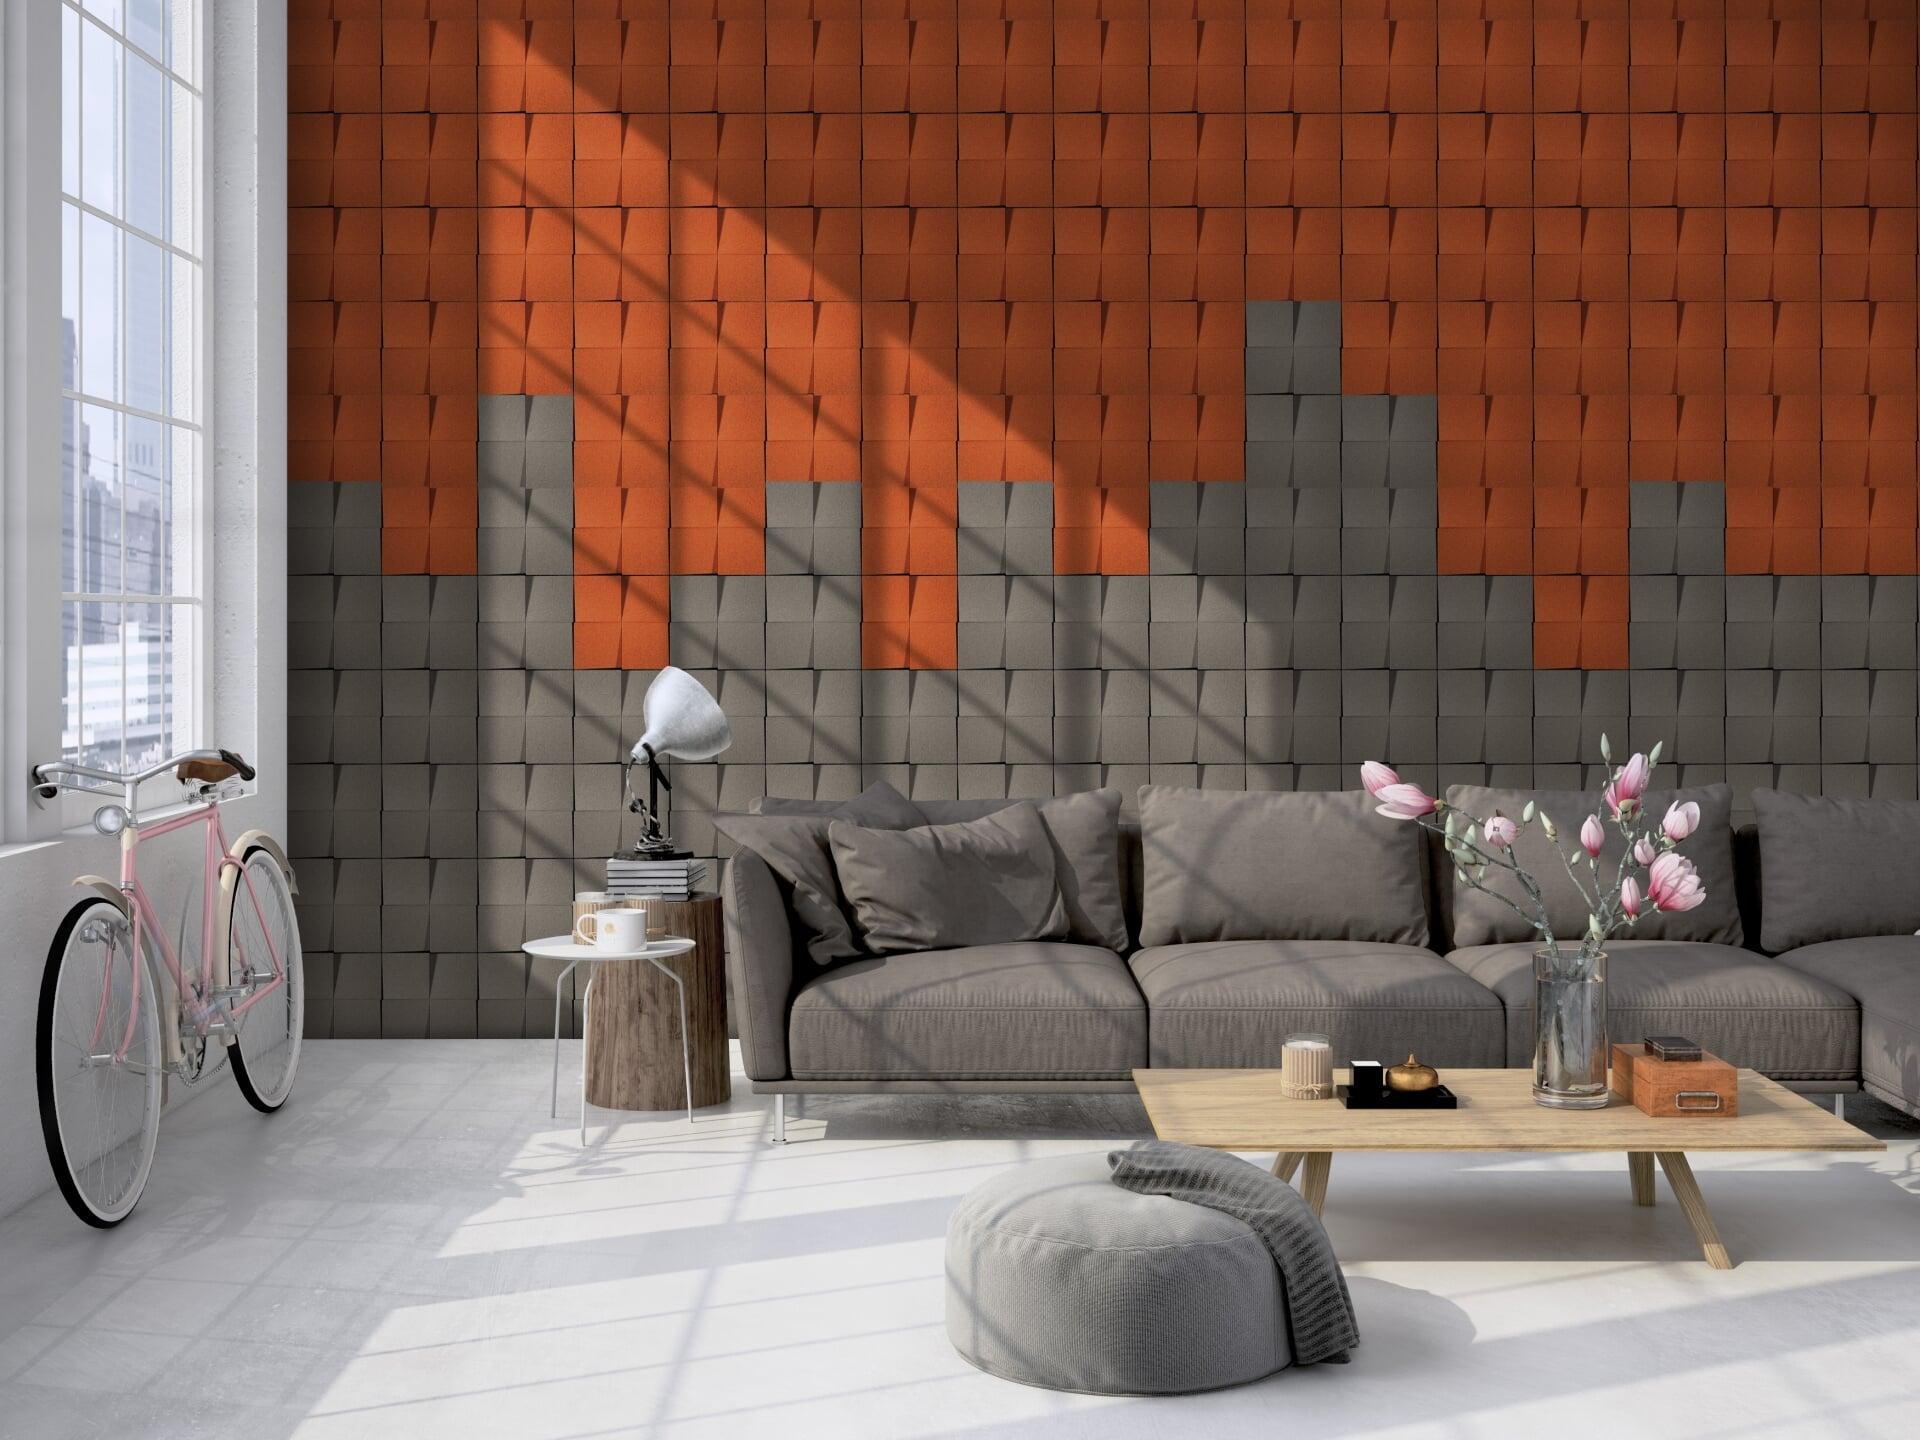 parede-chock-15320020042018